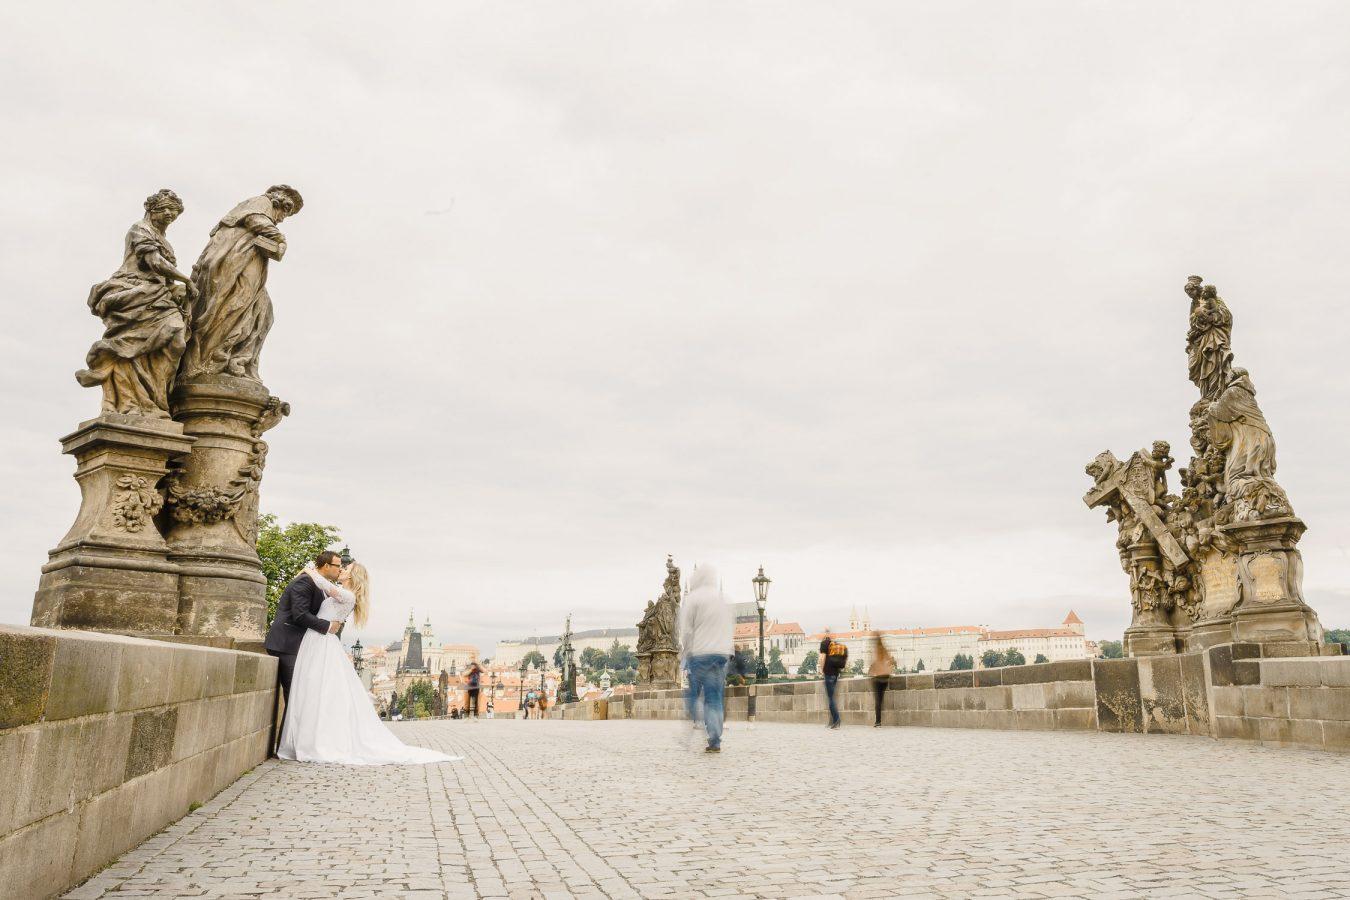 Wedding photoshoot at Charles Bridge